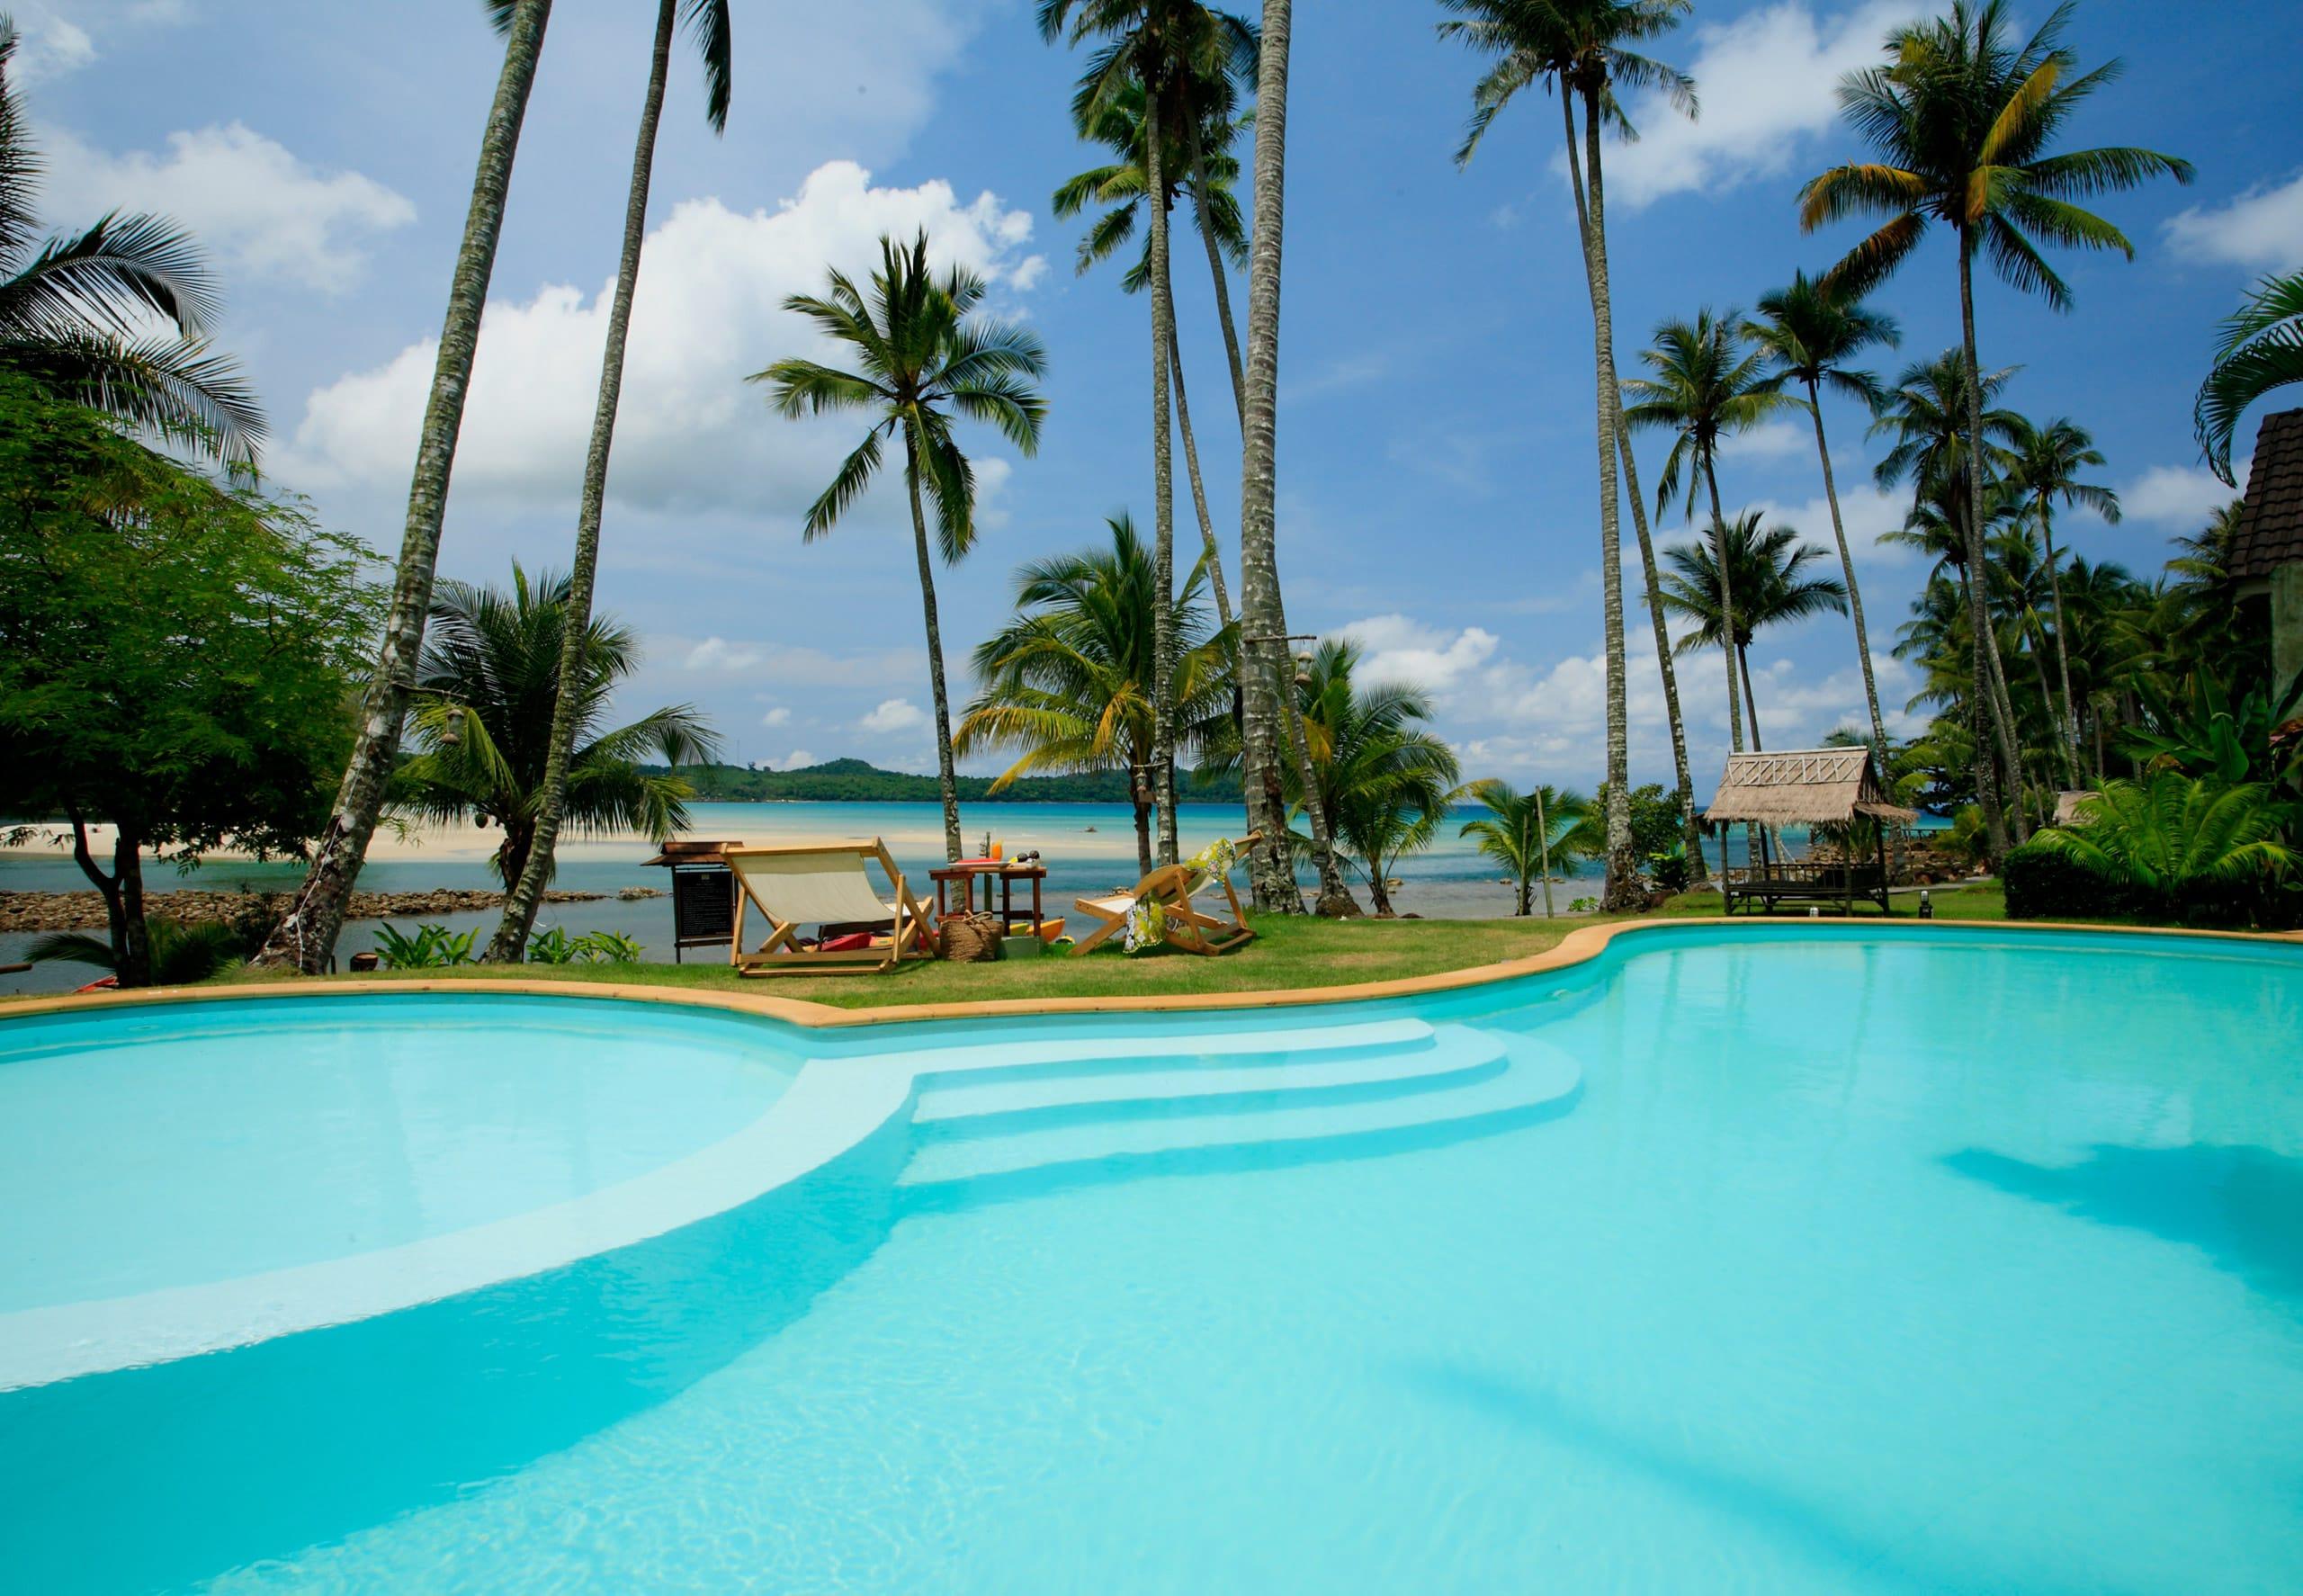 14-daagse hotelcombinatie vakantie Bangkok - Koh Kood - Koh Chang